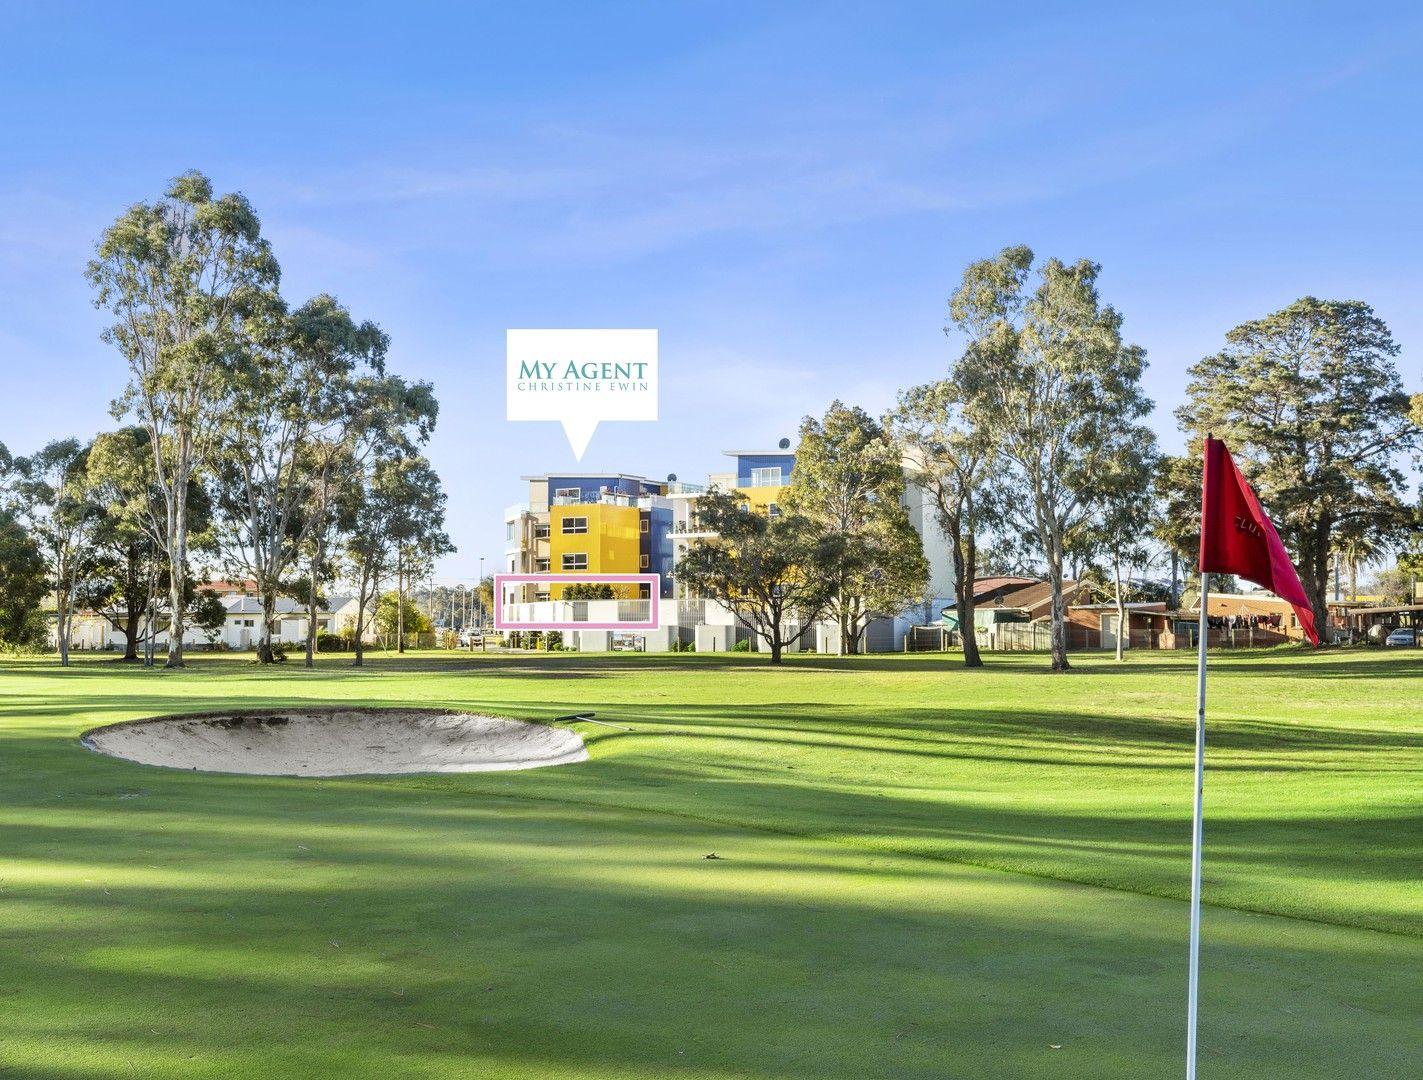 10/30 Golf Links Drive, Batemans Bay NSW 2536, Image 0